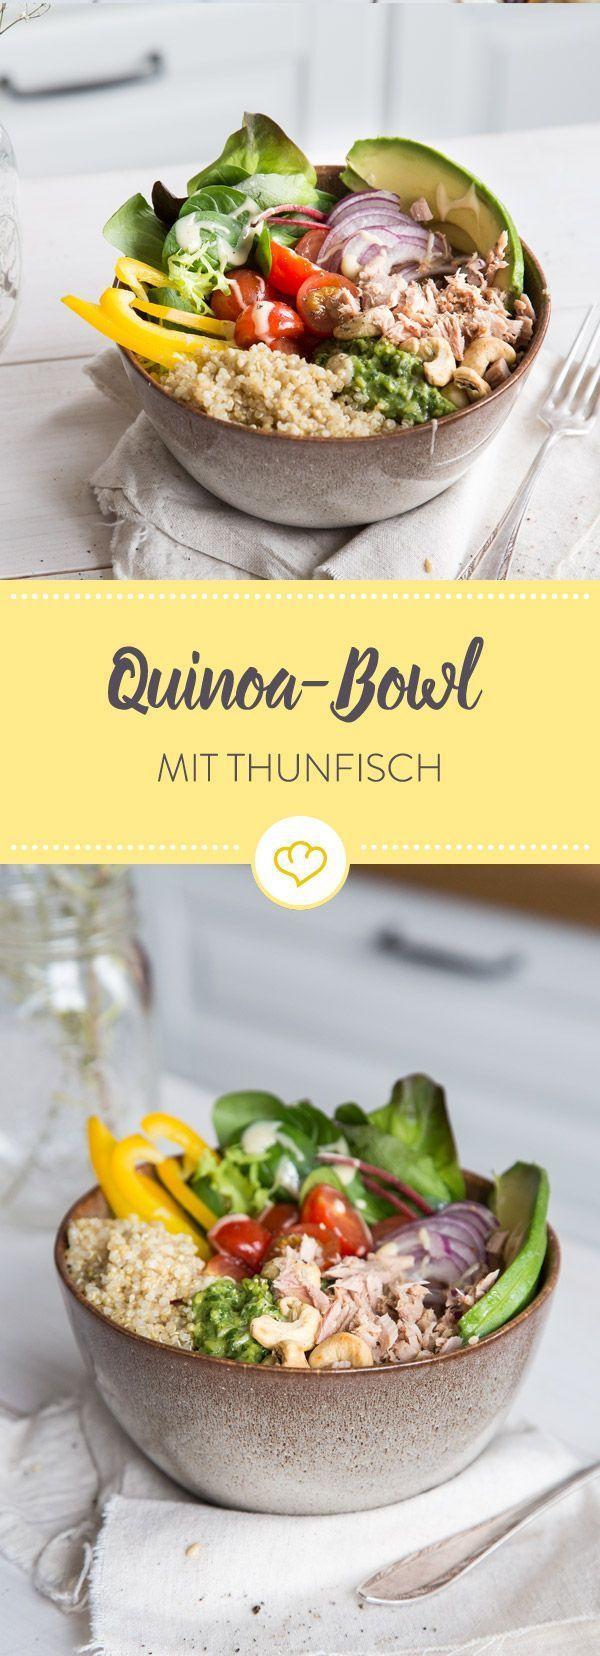 Thuna quinoa bowl with pesto - tuna from the bowl -  Do you fancy quinoa? Fancy tuna? Then this hea